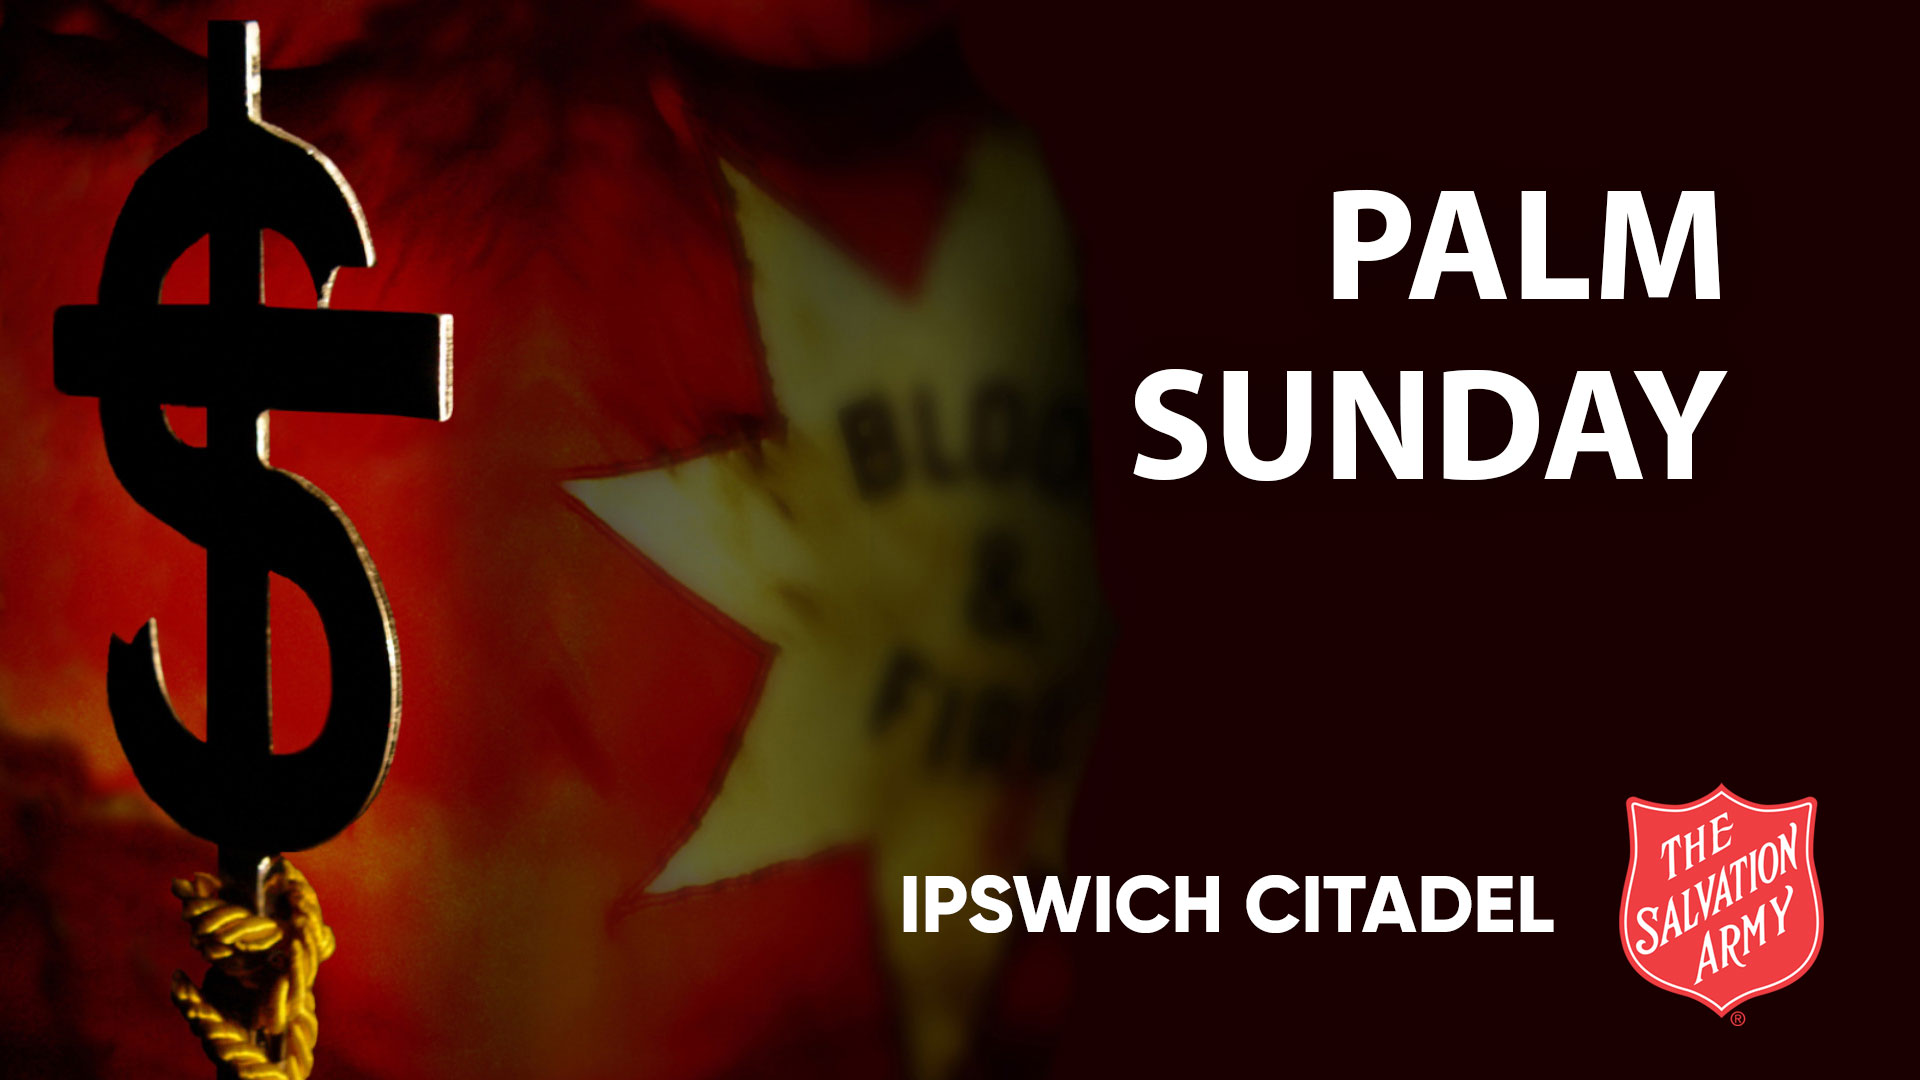 Sunday, 28 March 2021